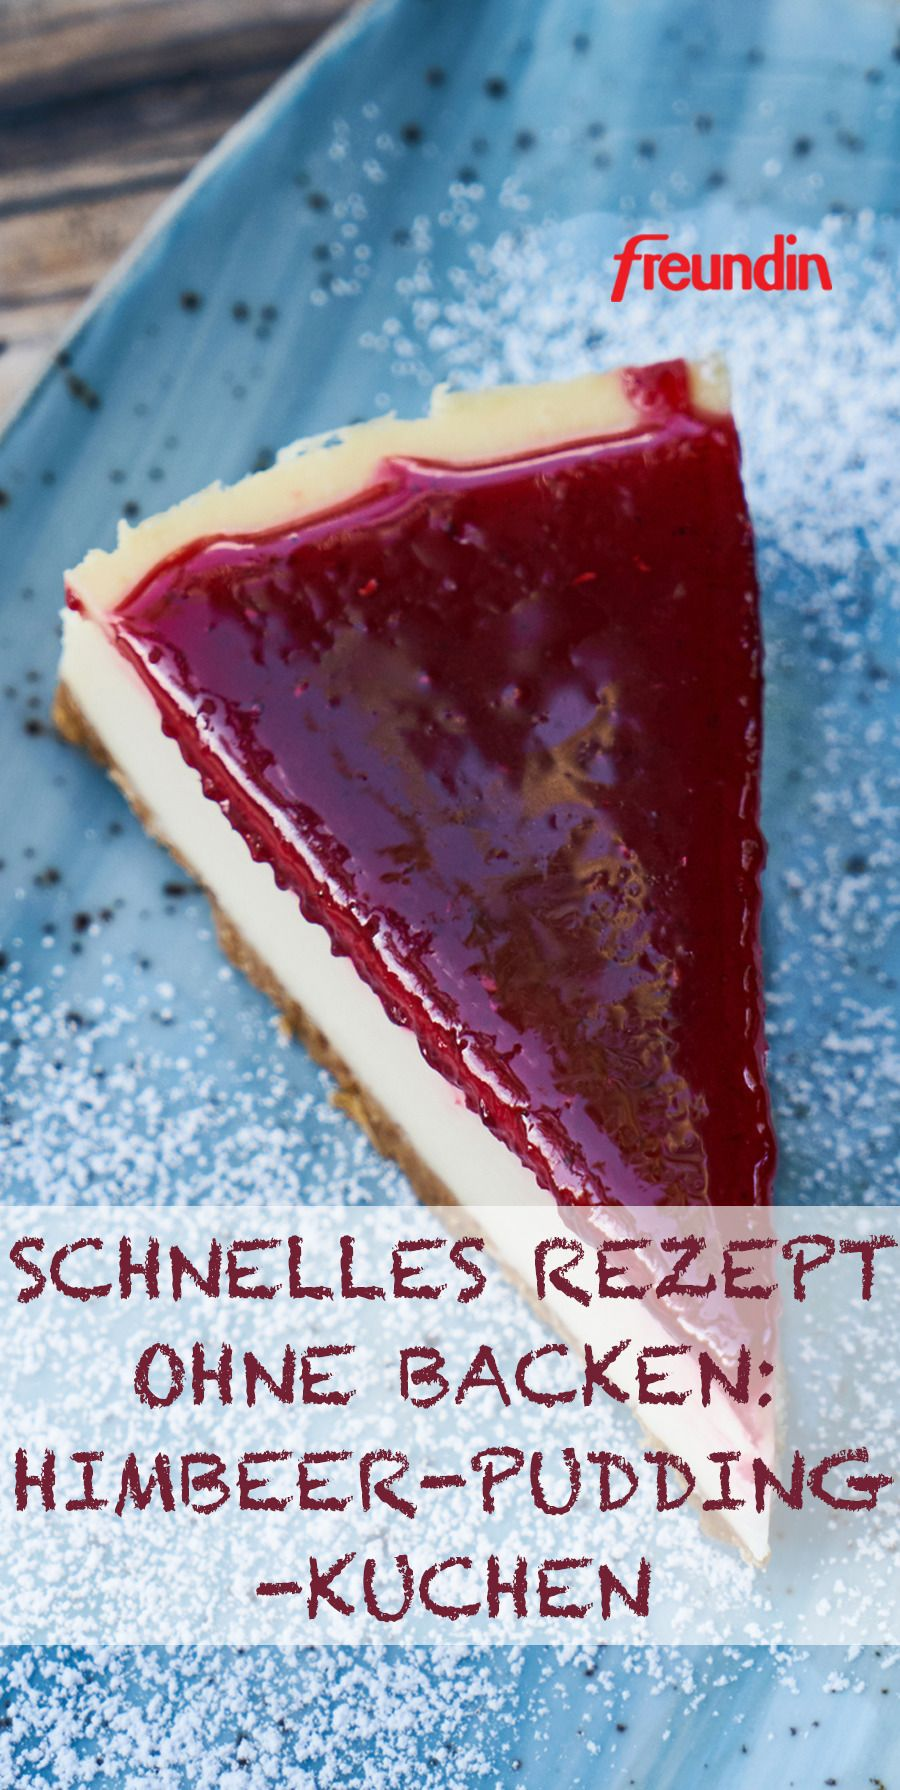 Schnelles Rezept Ohne Backen Himbeer Pudding Kuchen Freundin De In 2020 Kochen Und Backen Rezepte Einfache Rezepte Backen Kuchen Rezepte Einfach